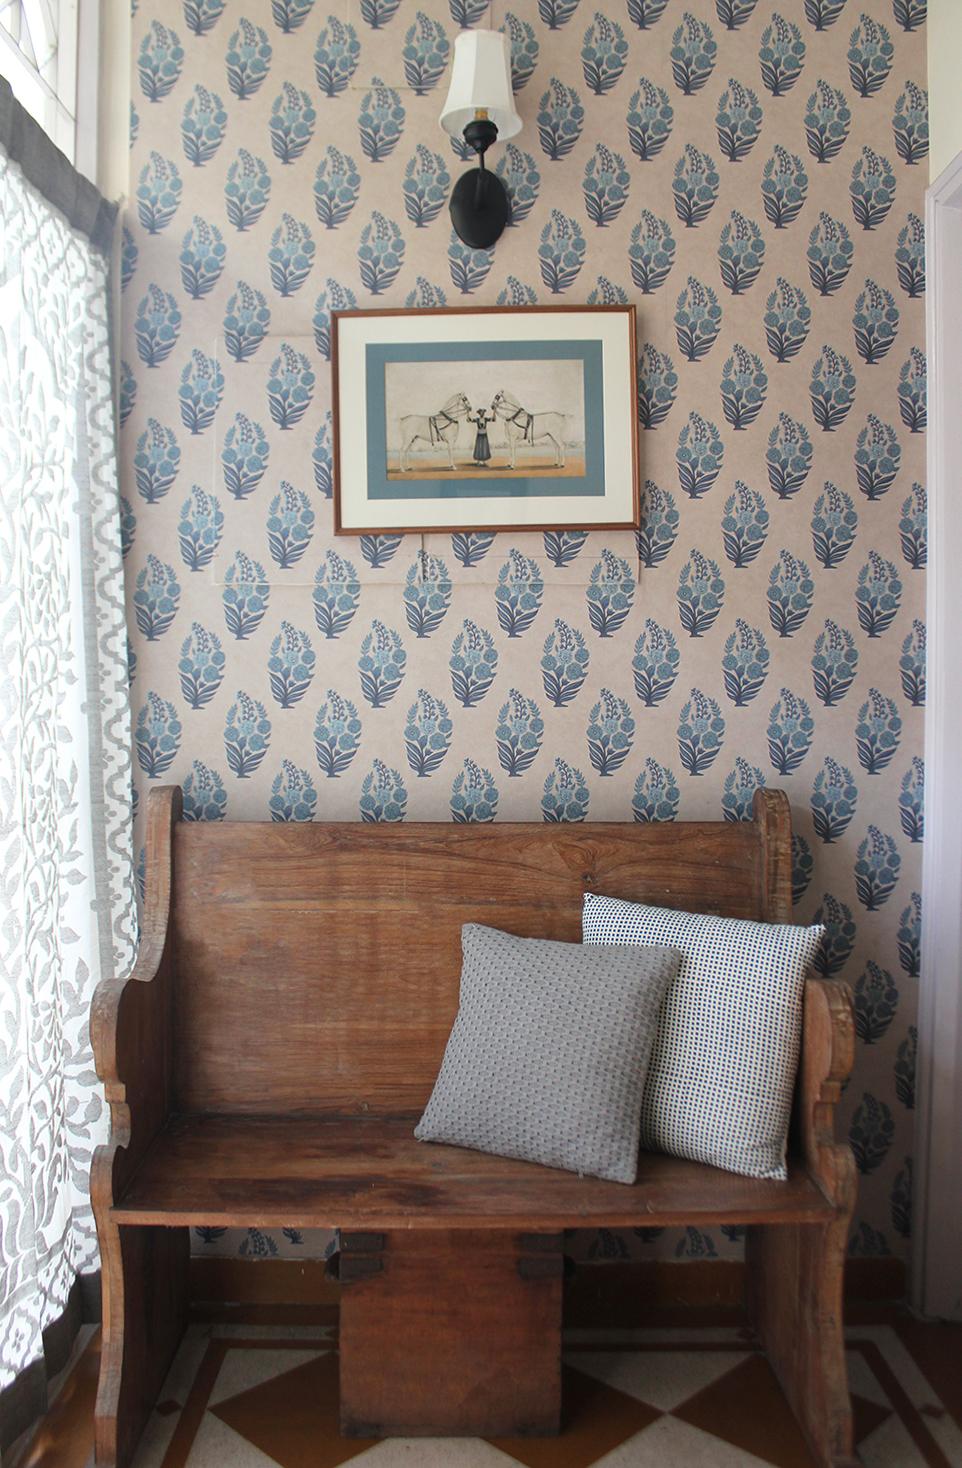 entryway, delhi, interior design, wallpaper, beautiful interiors, indian interiors, natural design, Shivani Dogra